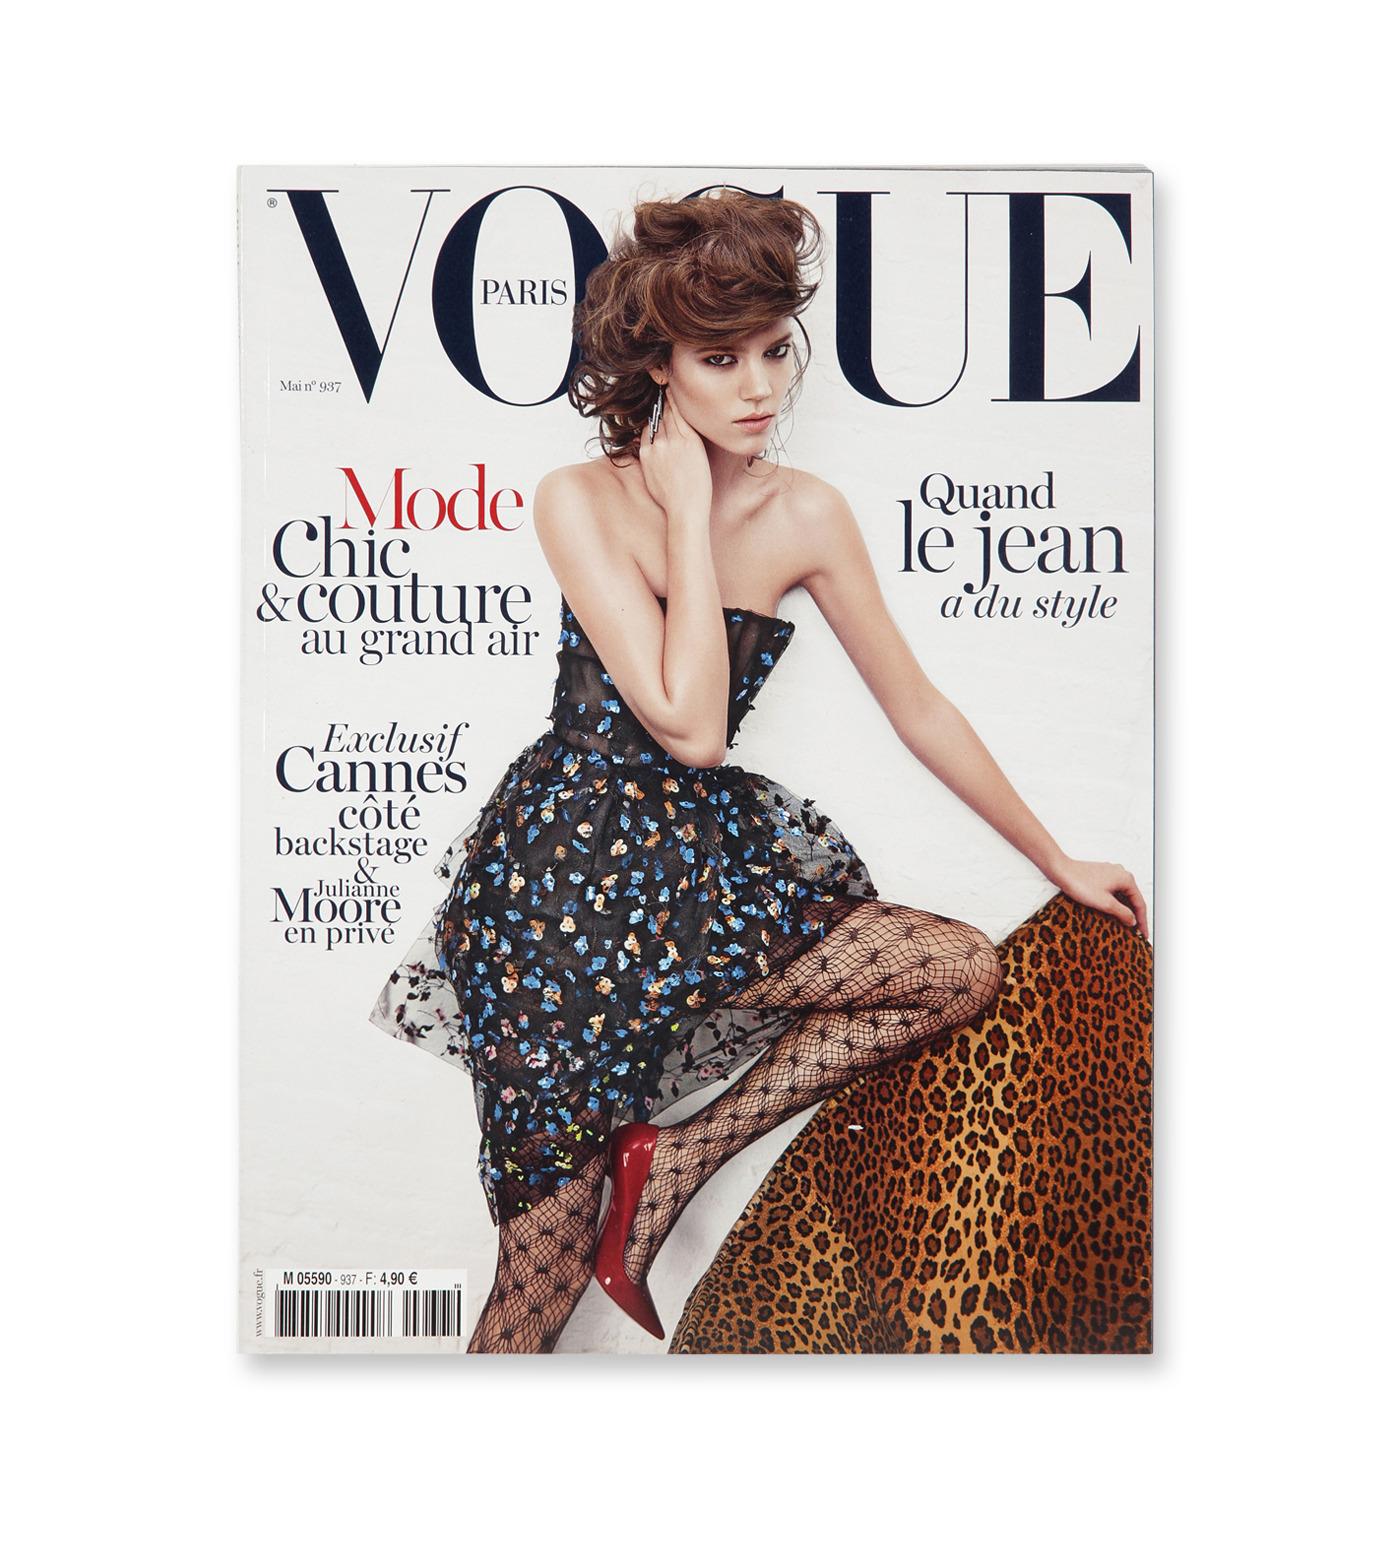 Magazine(マガジン)のVOGUE PARIS (MAY #937)-NONE-VO2722X13050-0 拡大詳細画像1